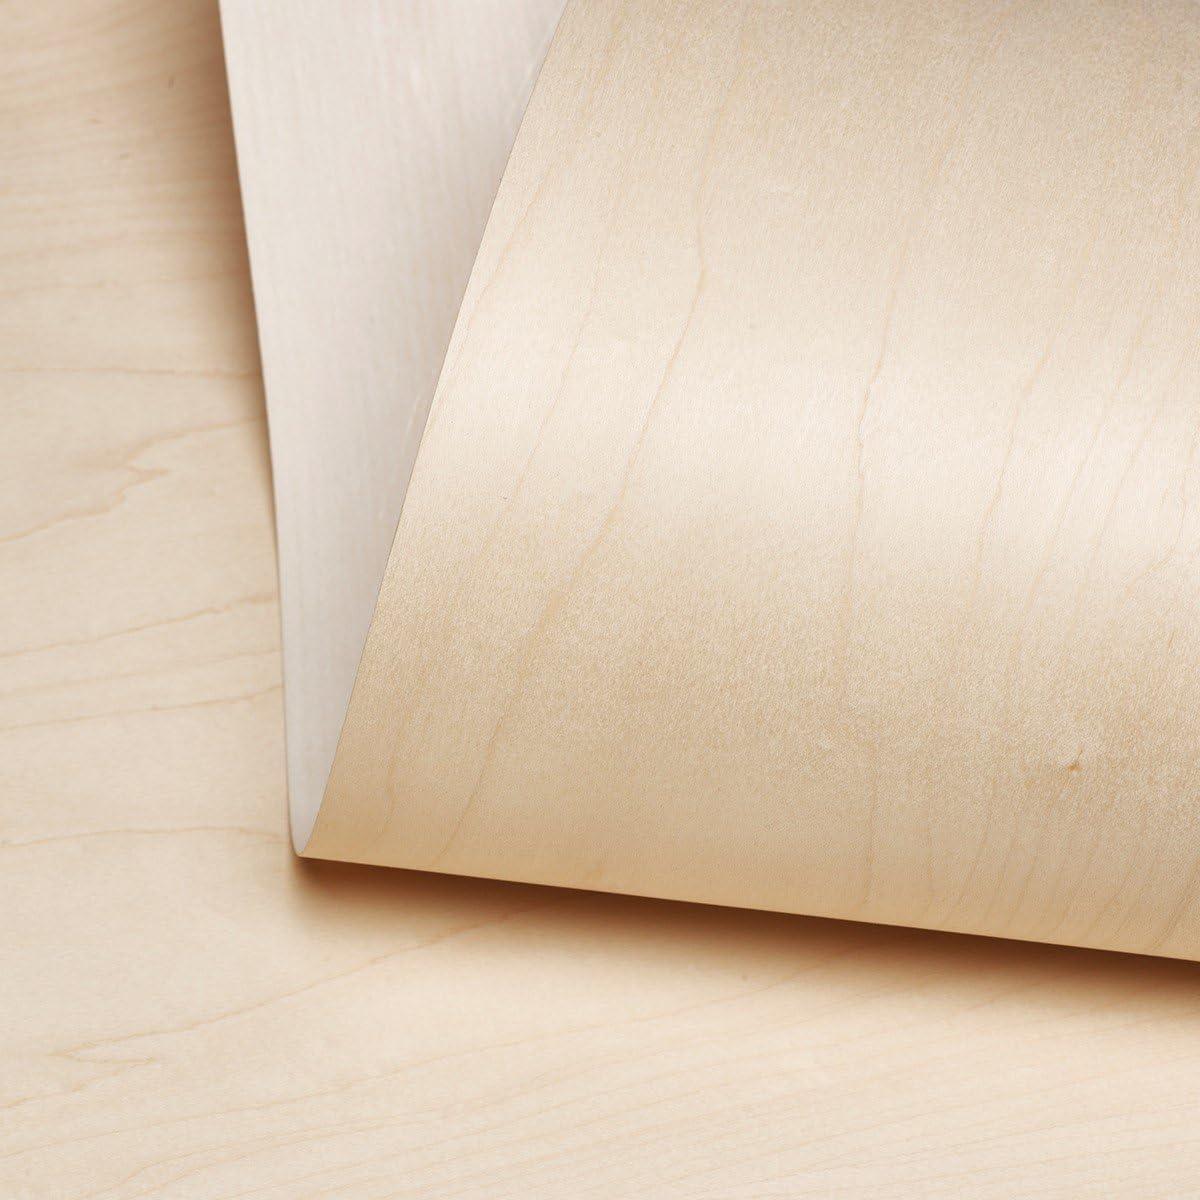 Edge Supply Maple Challenge the lowest price of Japan ☆ Wood Veneer Sheet Credence Flat Cut 24